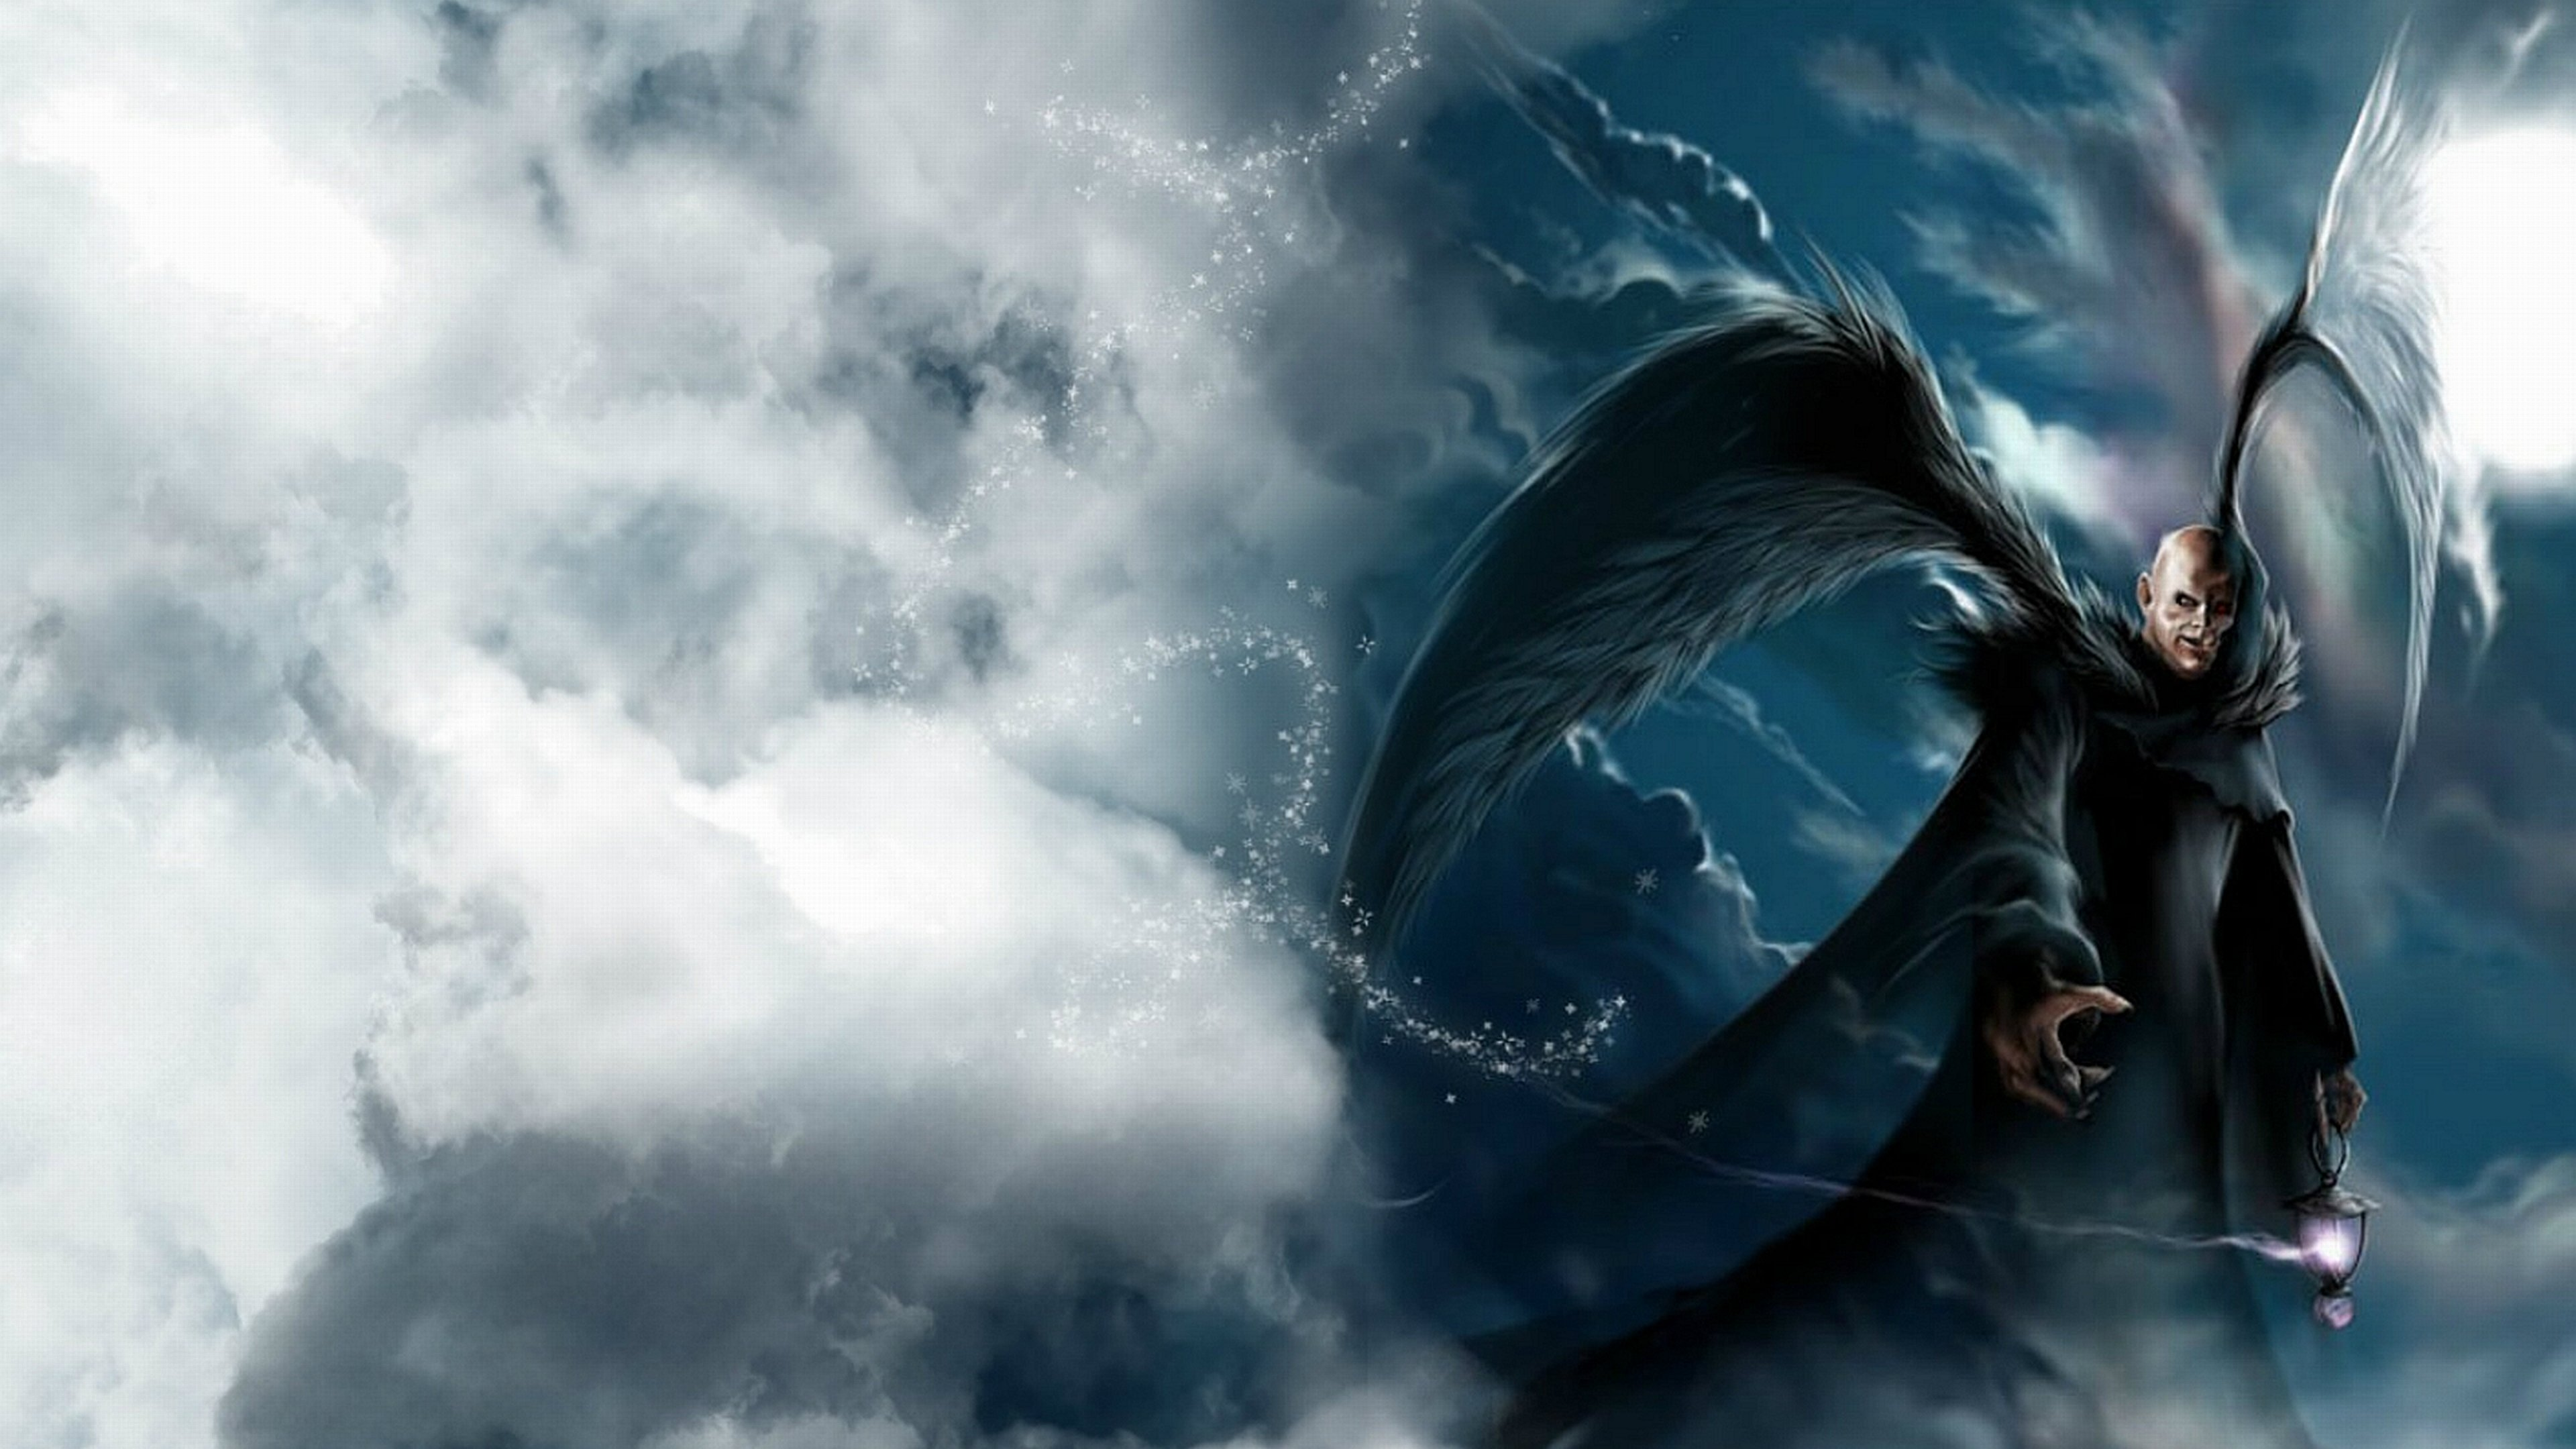 Download Ultra Hd 4k Dark Angel Pc Wallpaper Id142238 For Free